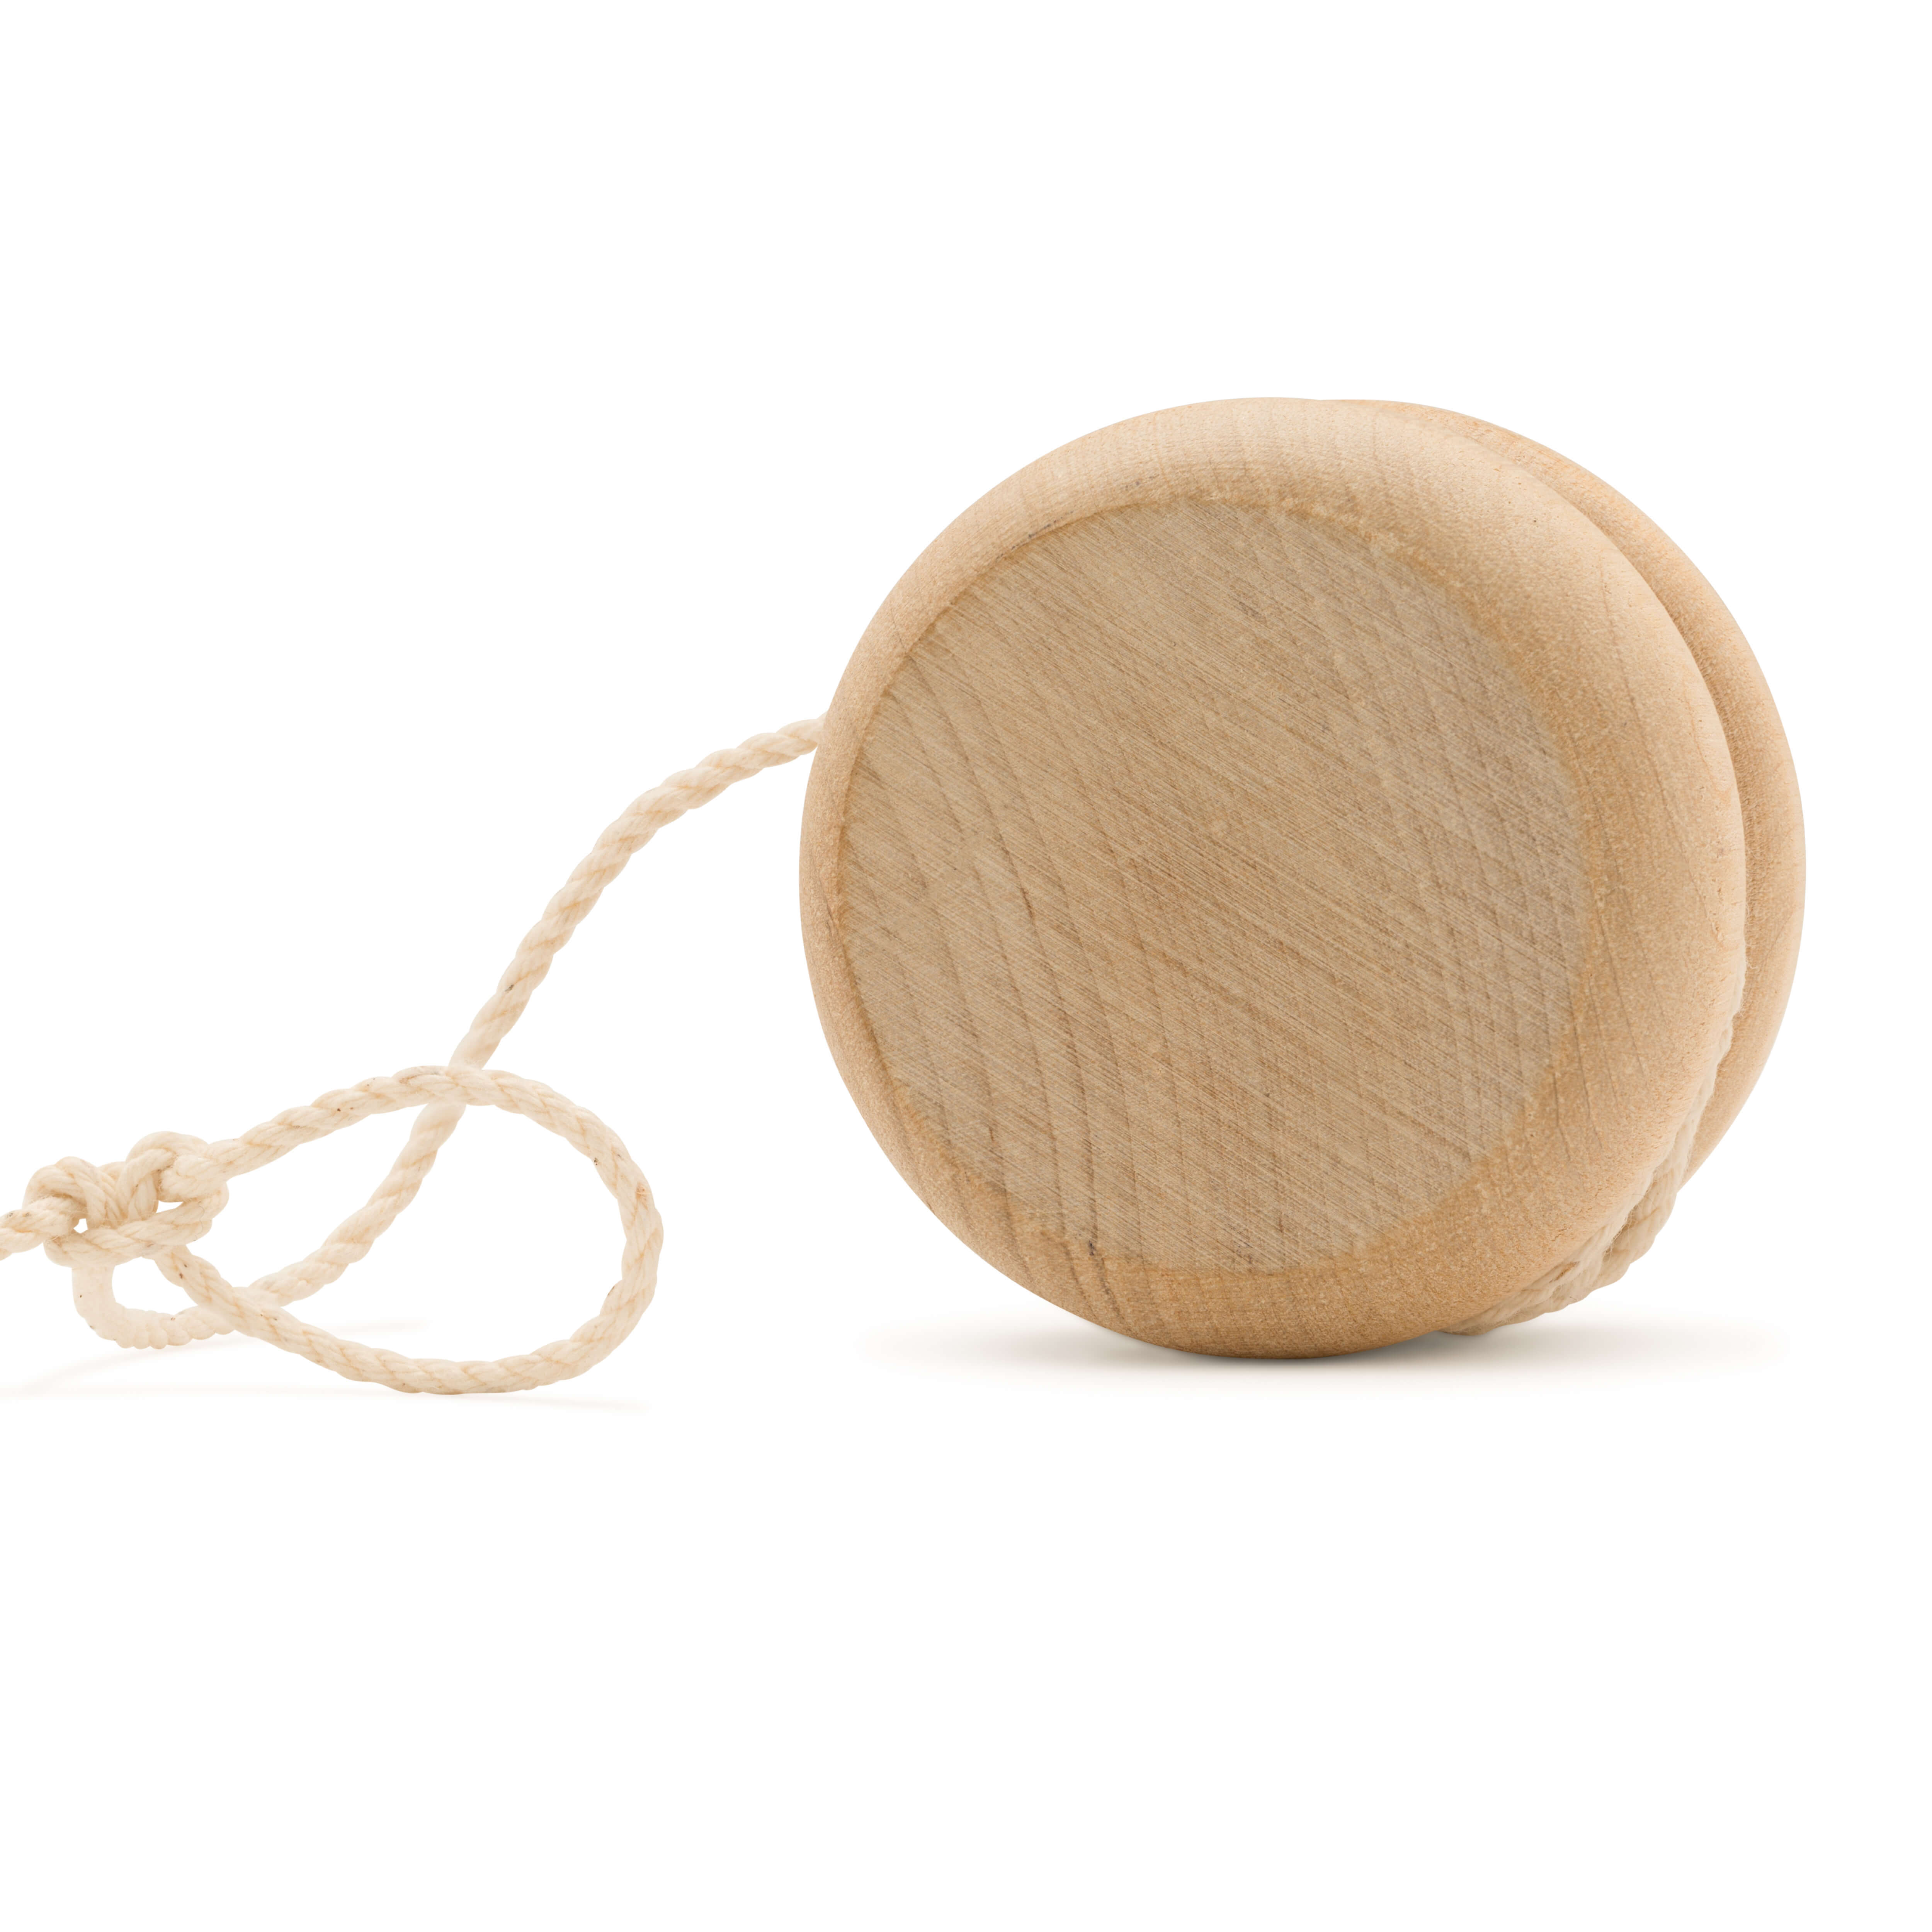 Wood Yo-Yos & Wooden Spin Tops